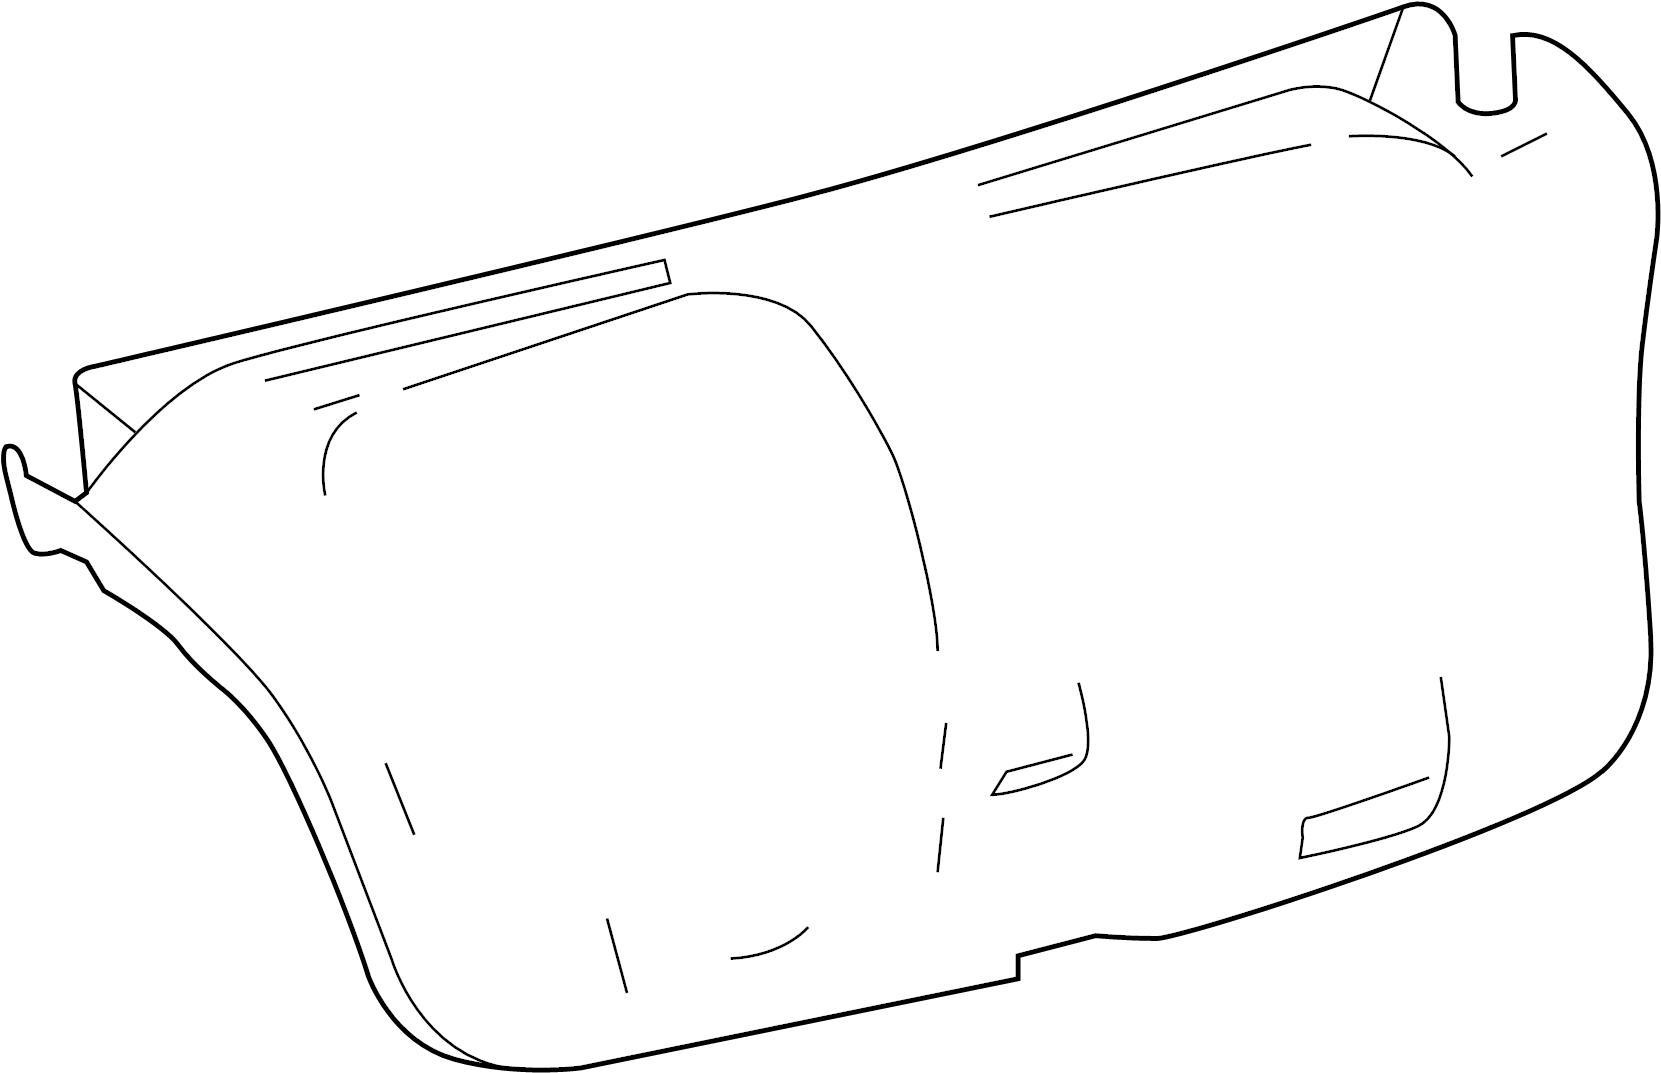 Toyota Avalon Deck Lid Trim Trunk Rear Interior Body